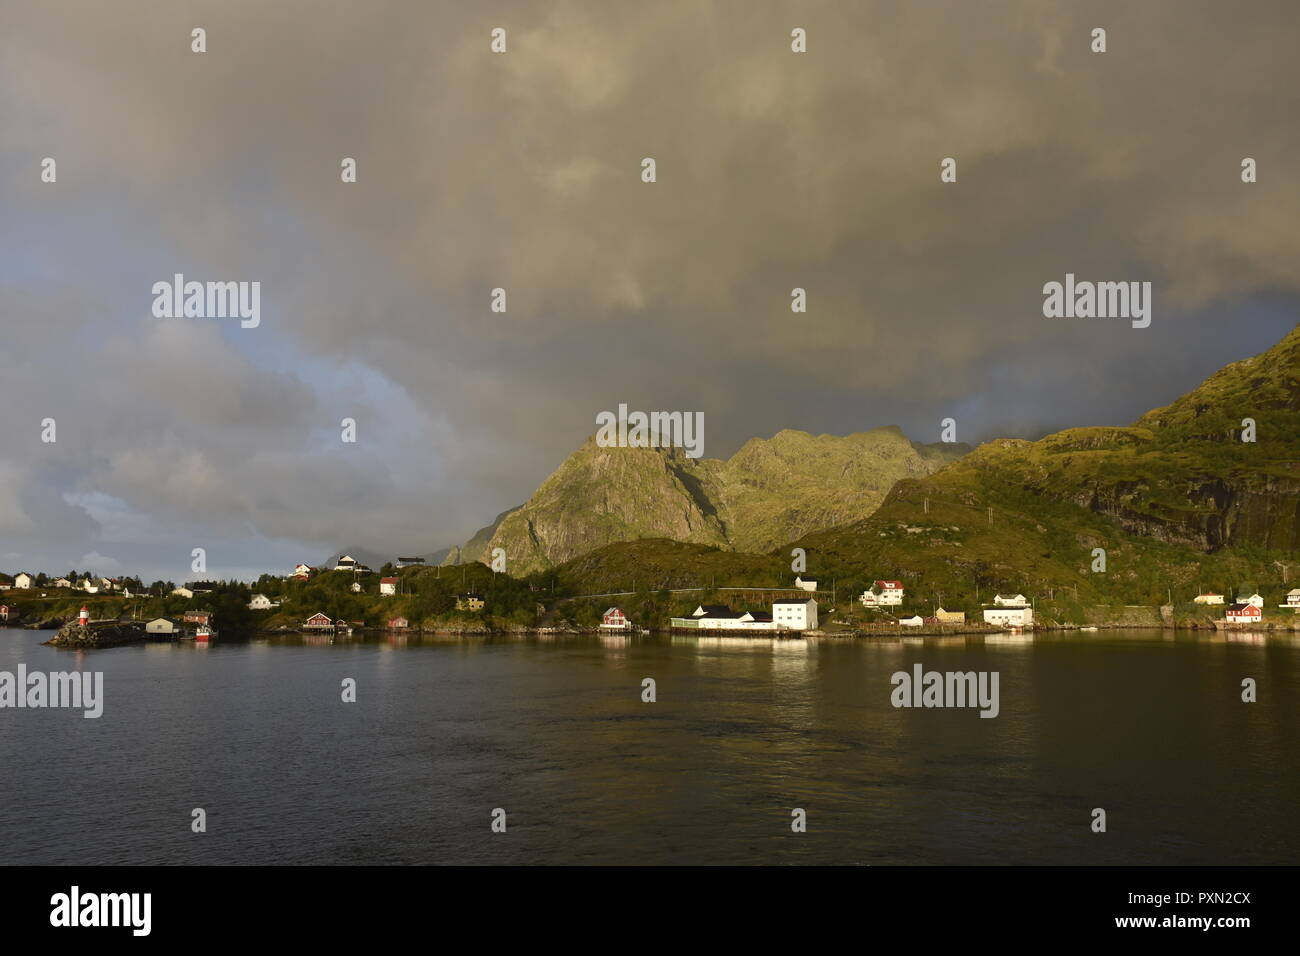 Norwegen, Lofoten, Moskenes, Hafen, Morgenrot, Nordland, Bodø, Moskenesøya, Insel, Mole, Leuchtturm, Leuchtfeuer, Dorf. Küste, Gipfel, Berge - Stock Image